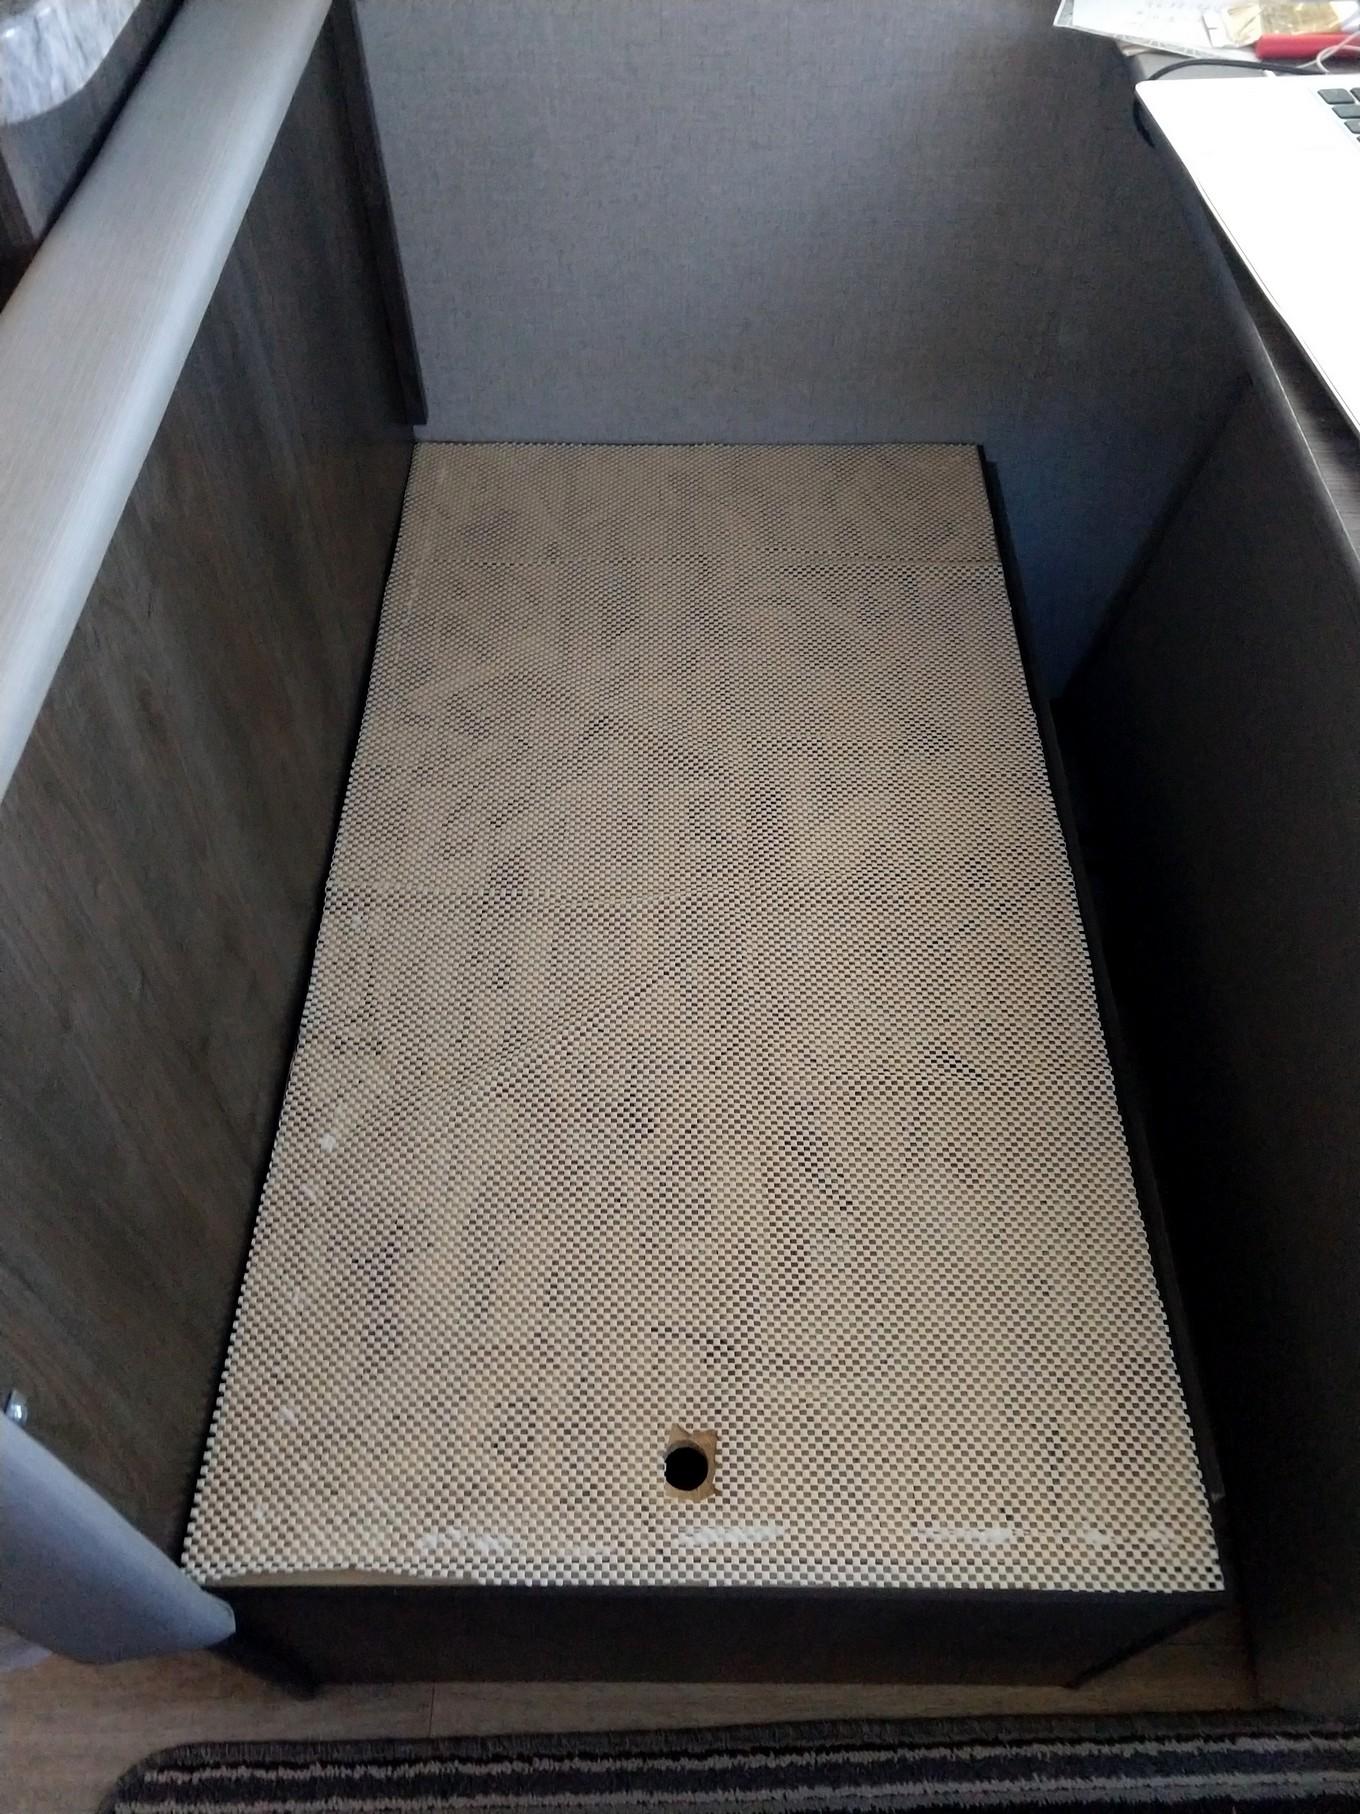 under dinette seats to prevent sliding (1)